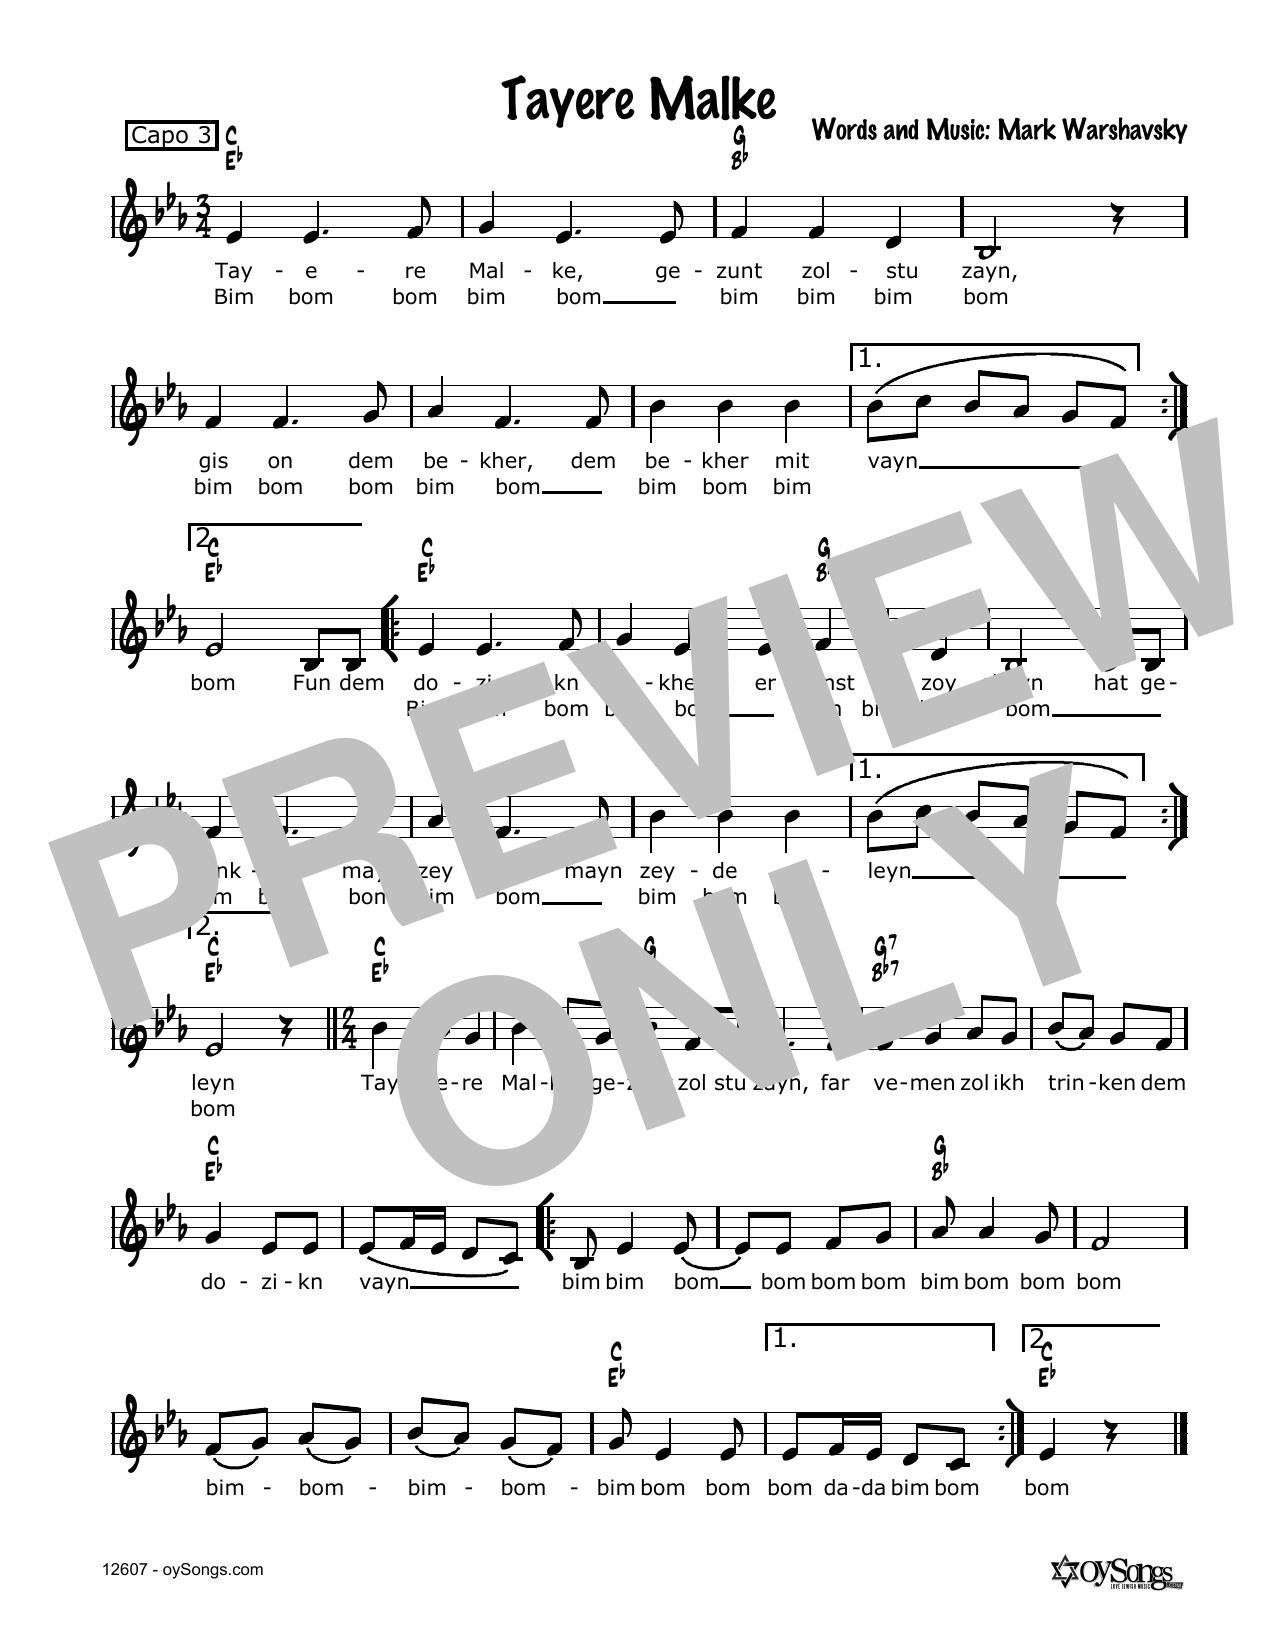 Tayere Malke Sheet Music